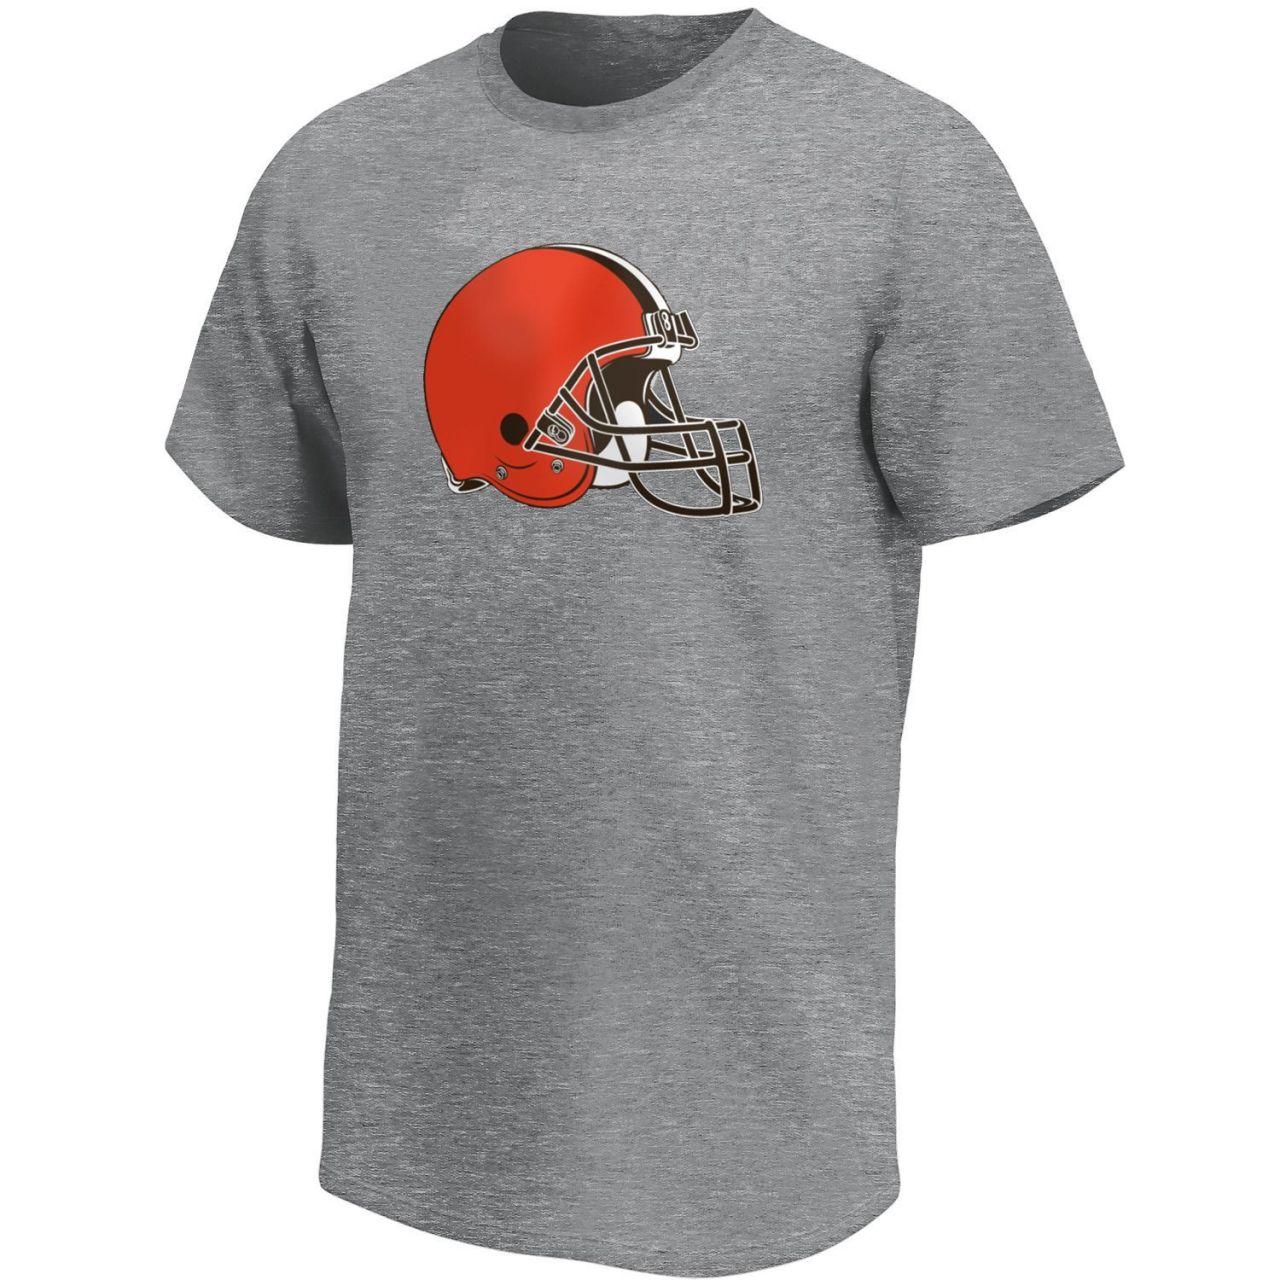 amfoo - Cleveland Browns NFL Fan T-Shirt Iconic Logo grau